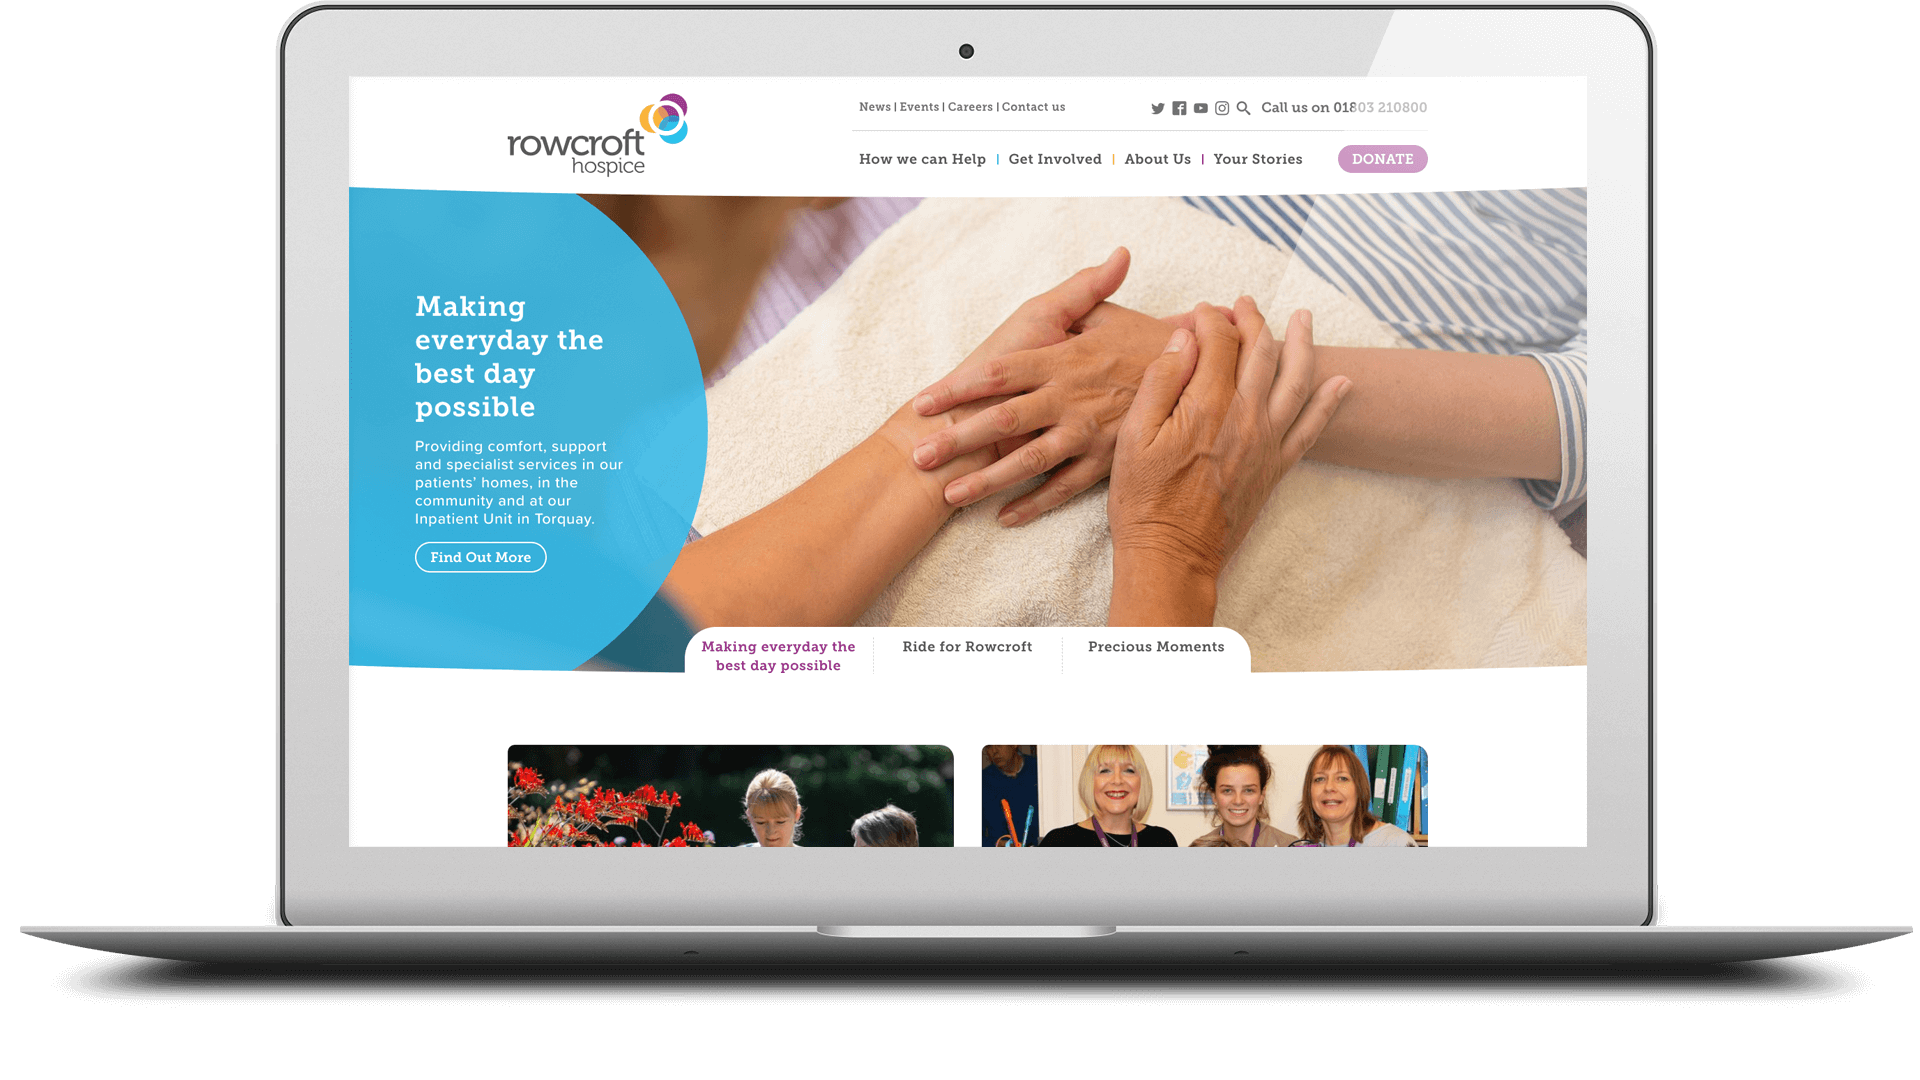 rowcroft website inner page